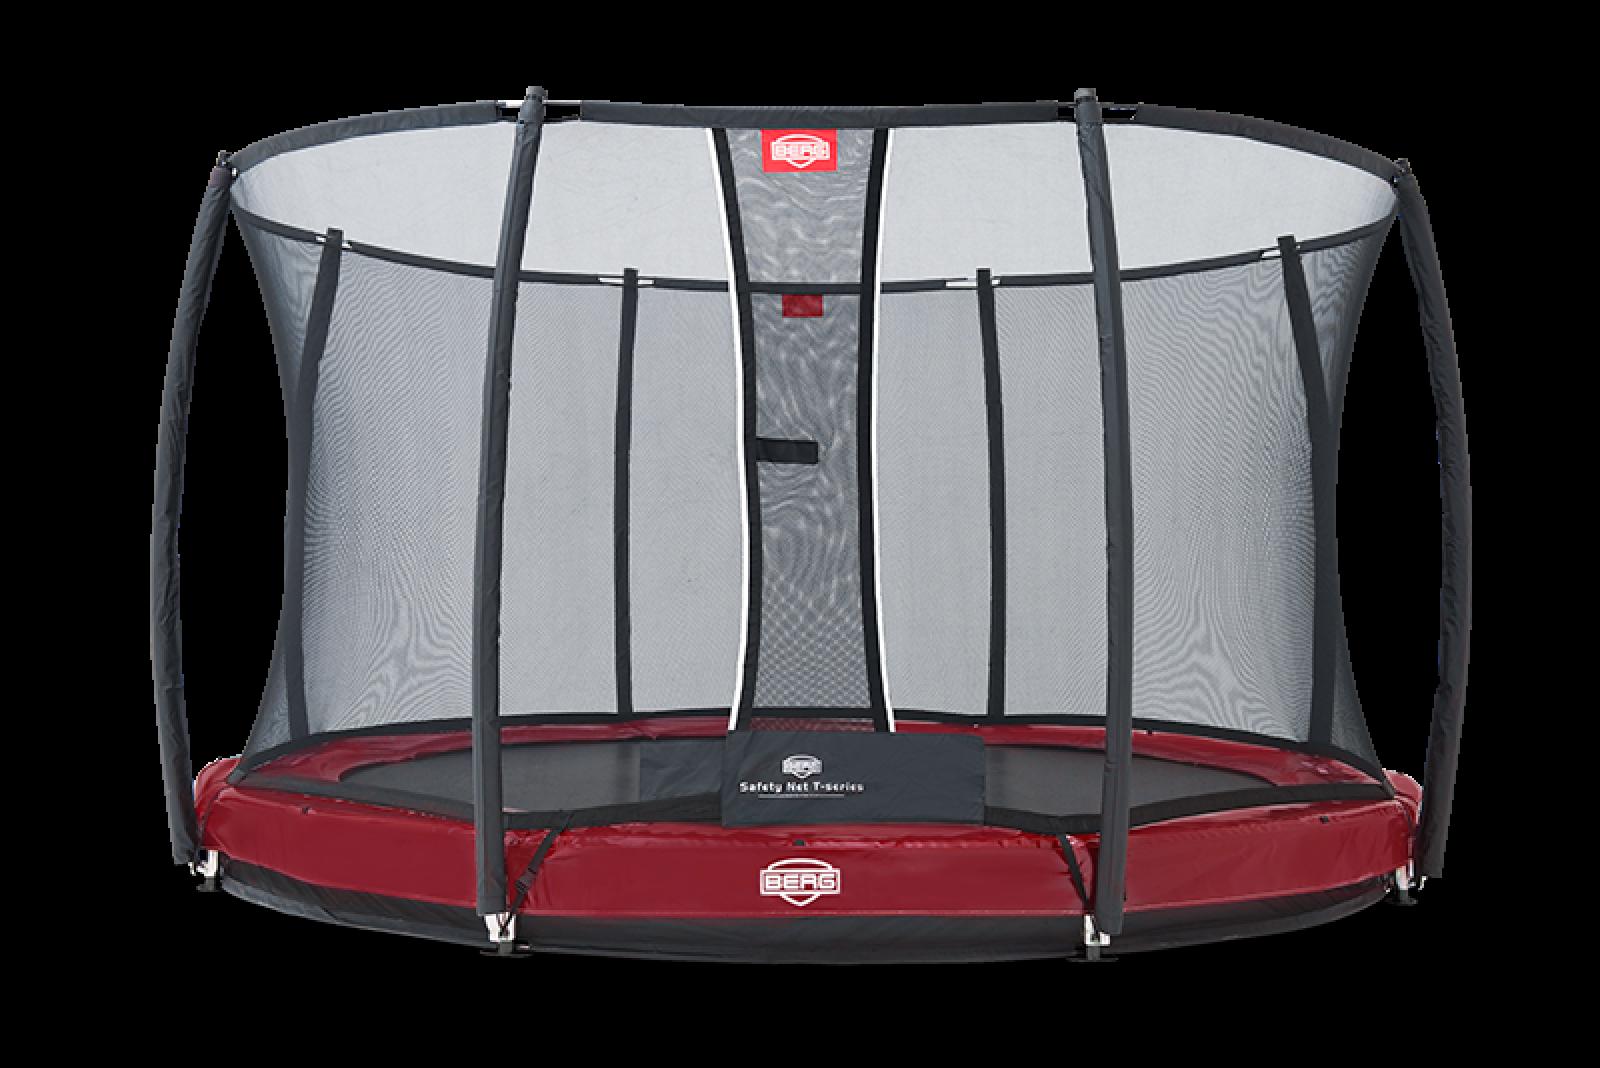 berg trampolin elite inground inkl netz t serie kaufen test sport tiedje. Black Bedroom Furniture Sets. Home Design Ideas